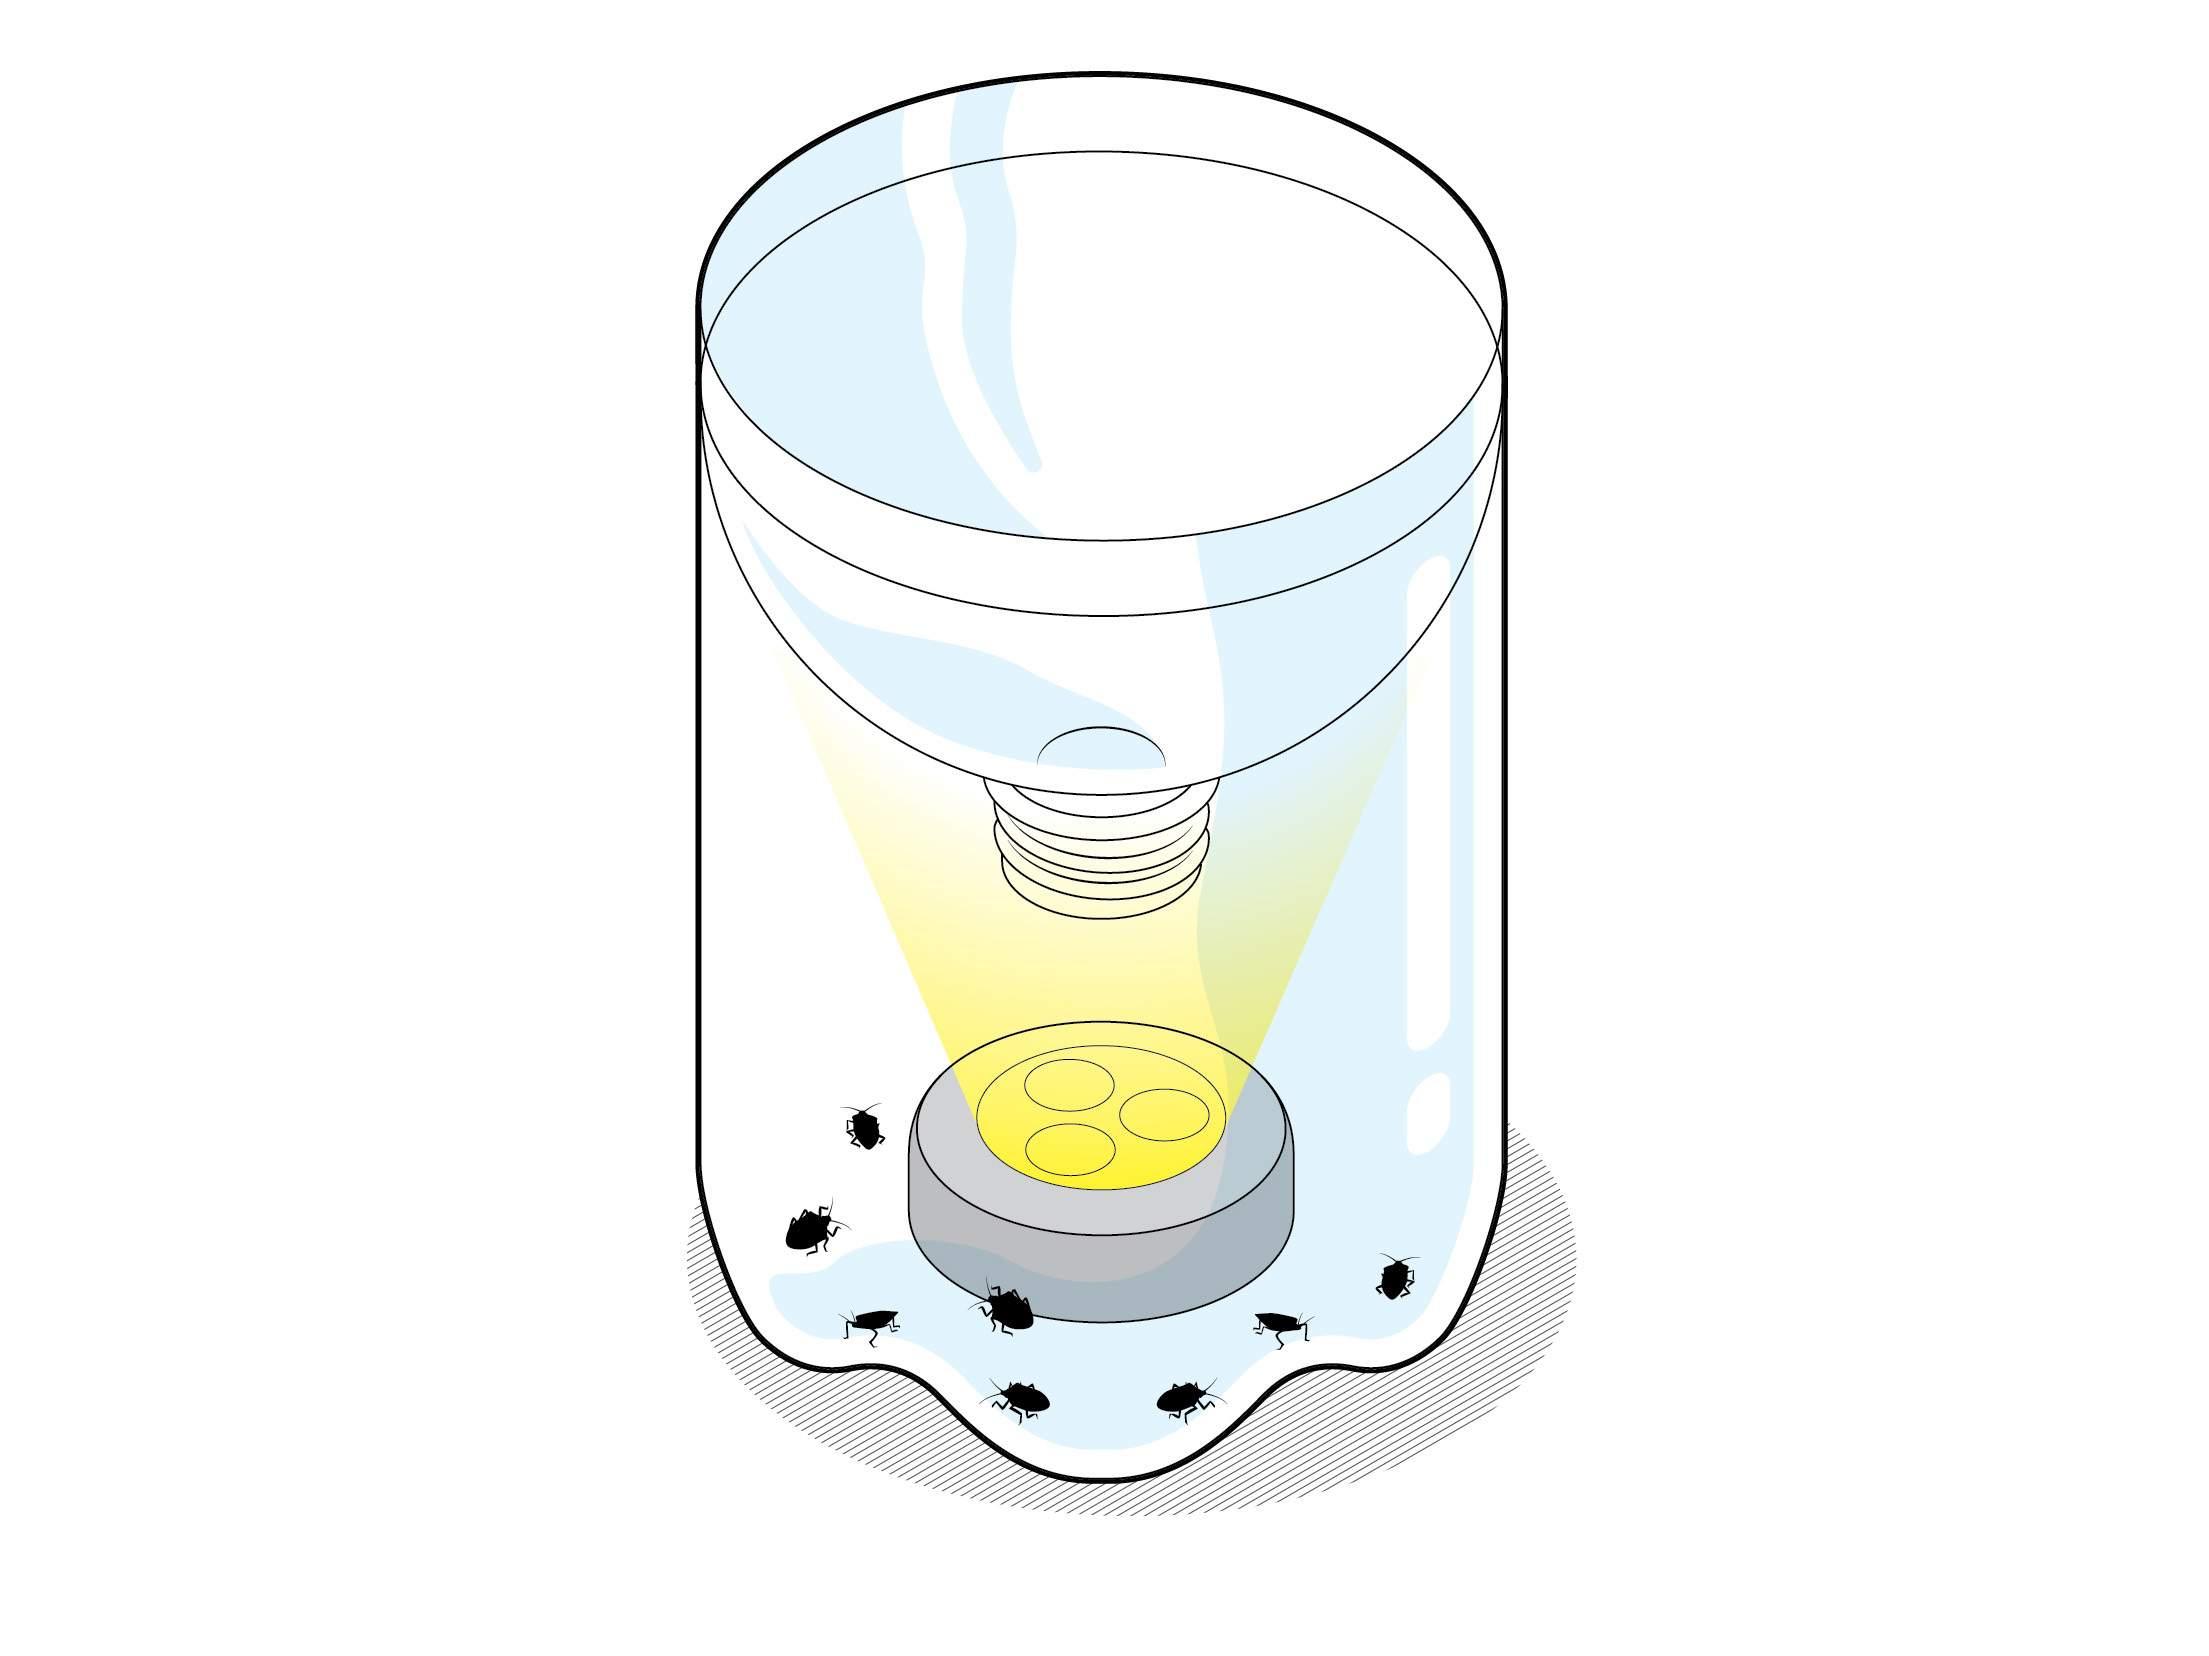 A homemade stinkbug trap